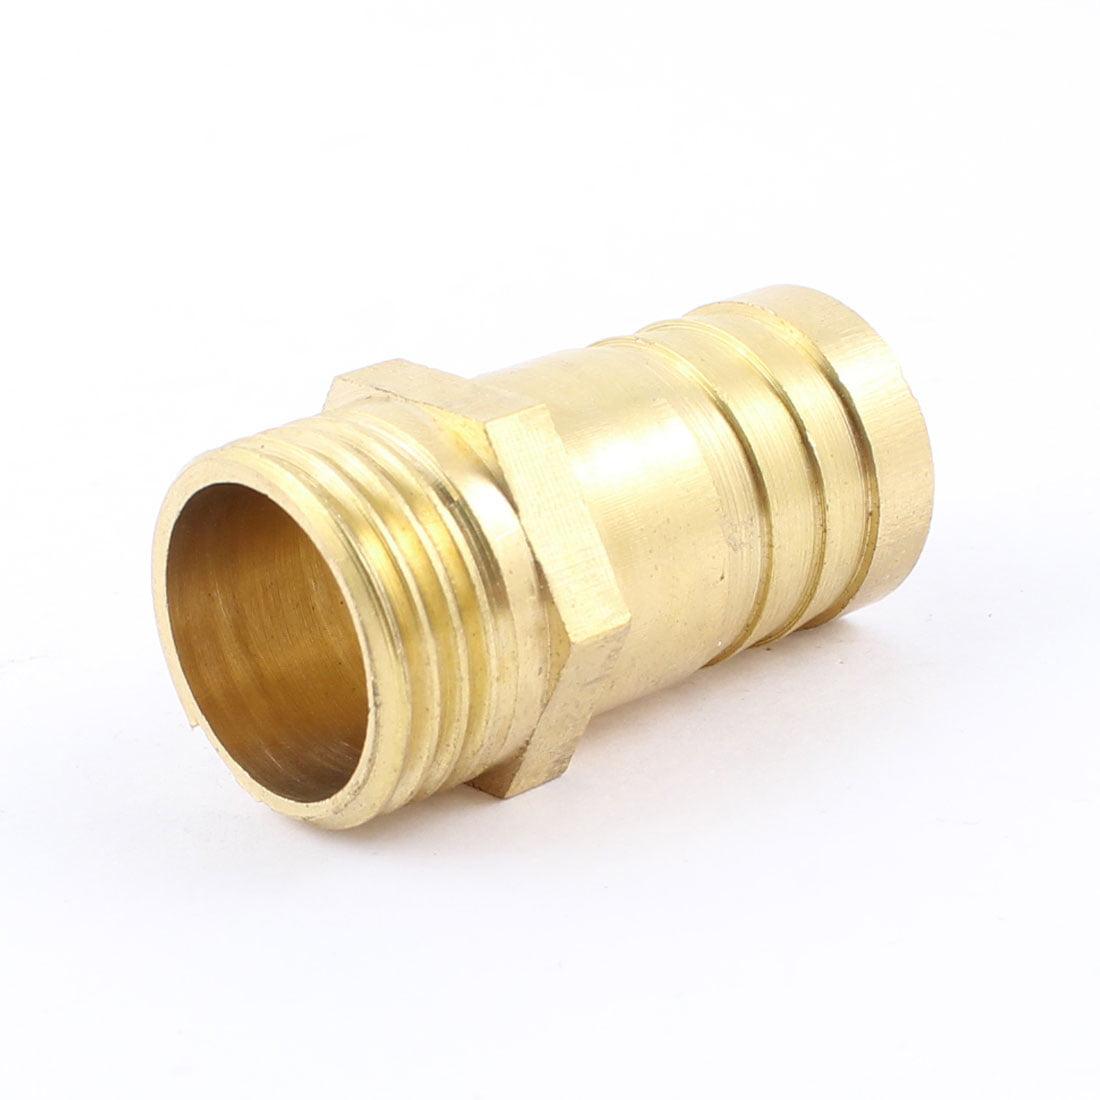 "Unique Bargains 20.2mm 1/2"" PT Male 19mm Hose Barb Nipple Brass Gas Quick Coupling Connector - image 1 of 1"